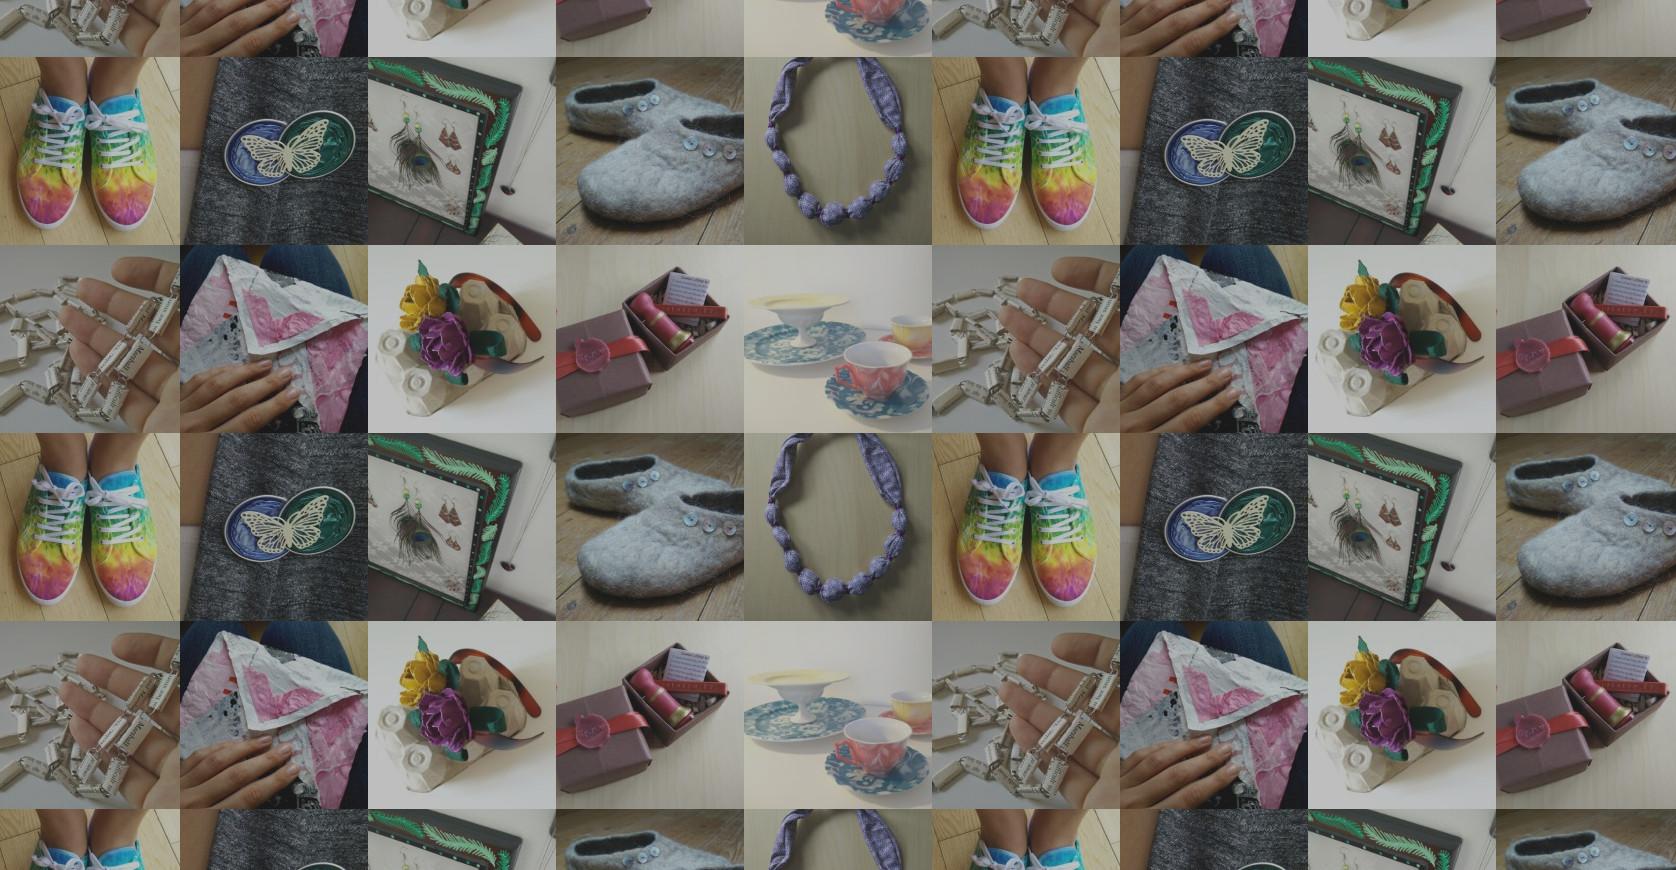 10 cheap and easy home made gift ideas paris en rose for Cheap and easy gift ideas